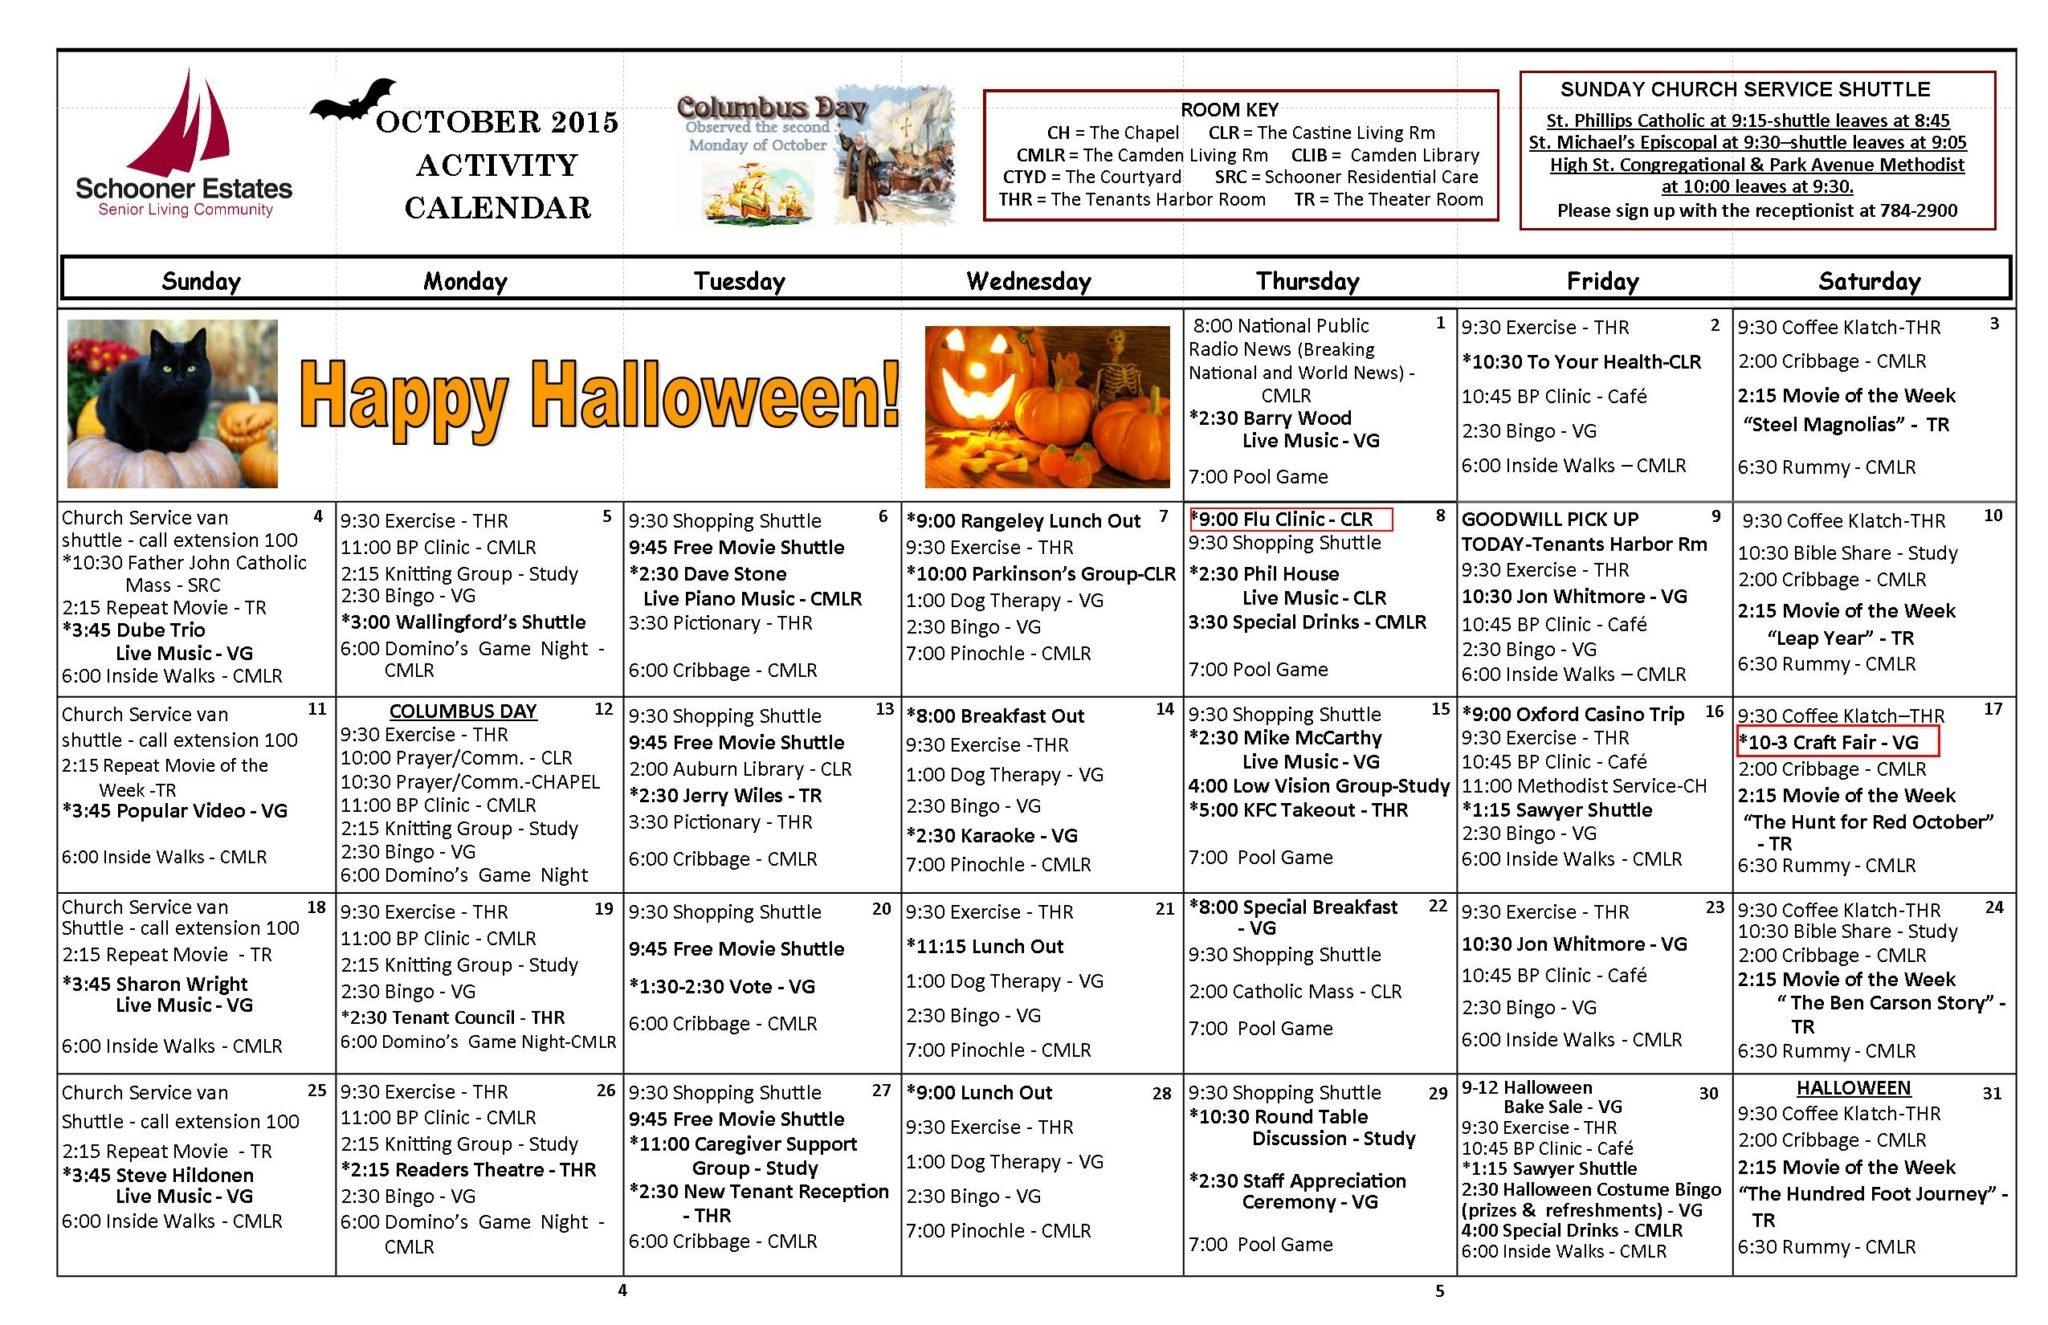 October 2015 Independent Living Activity Calendar